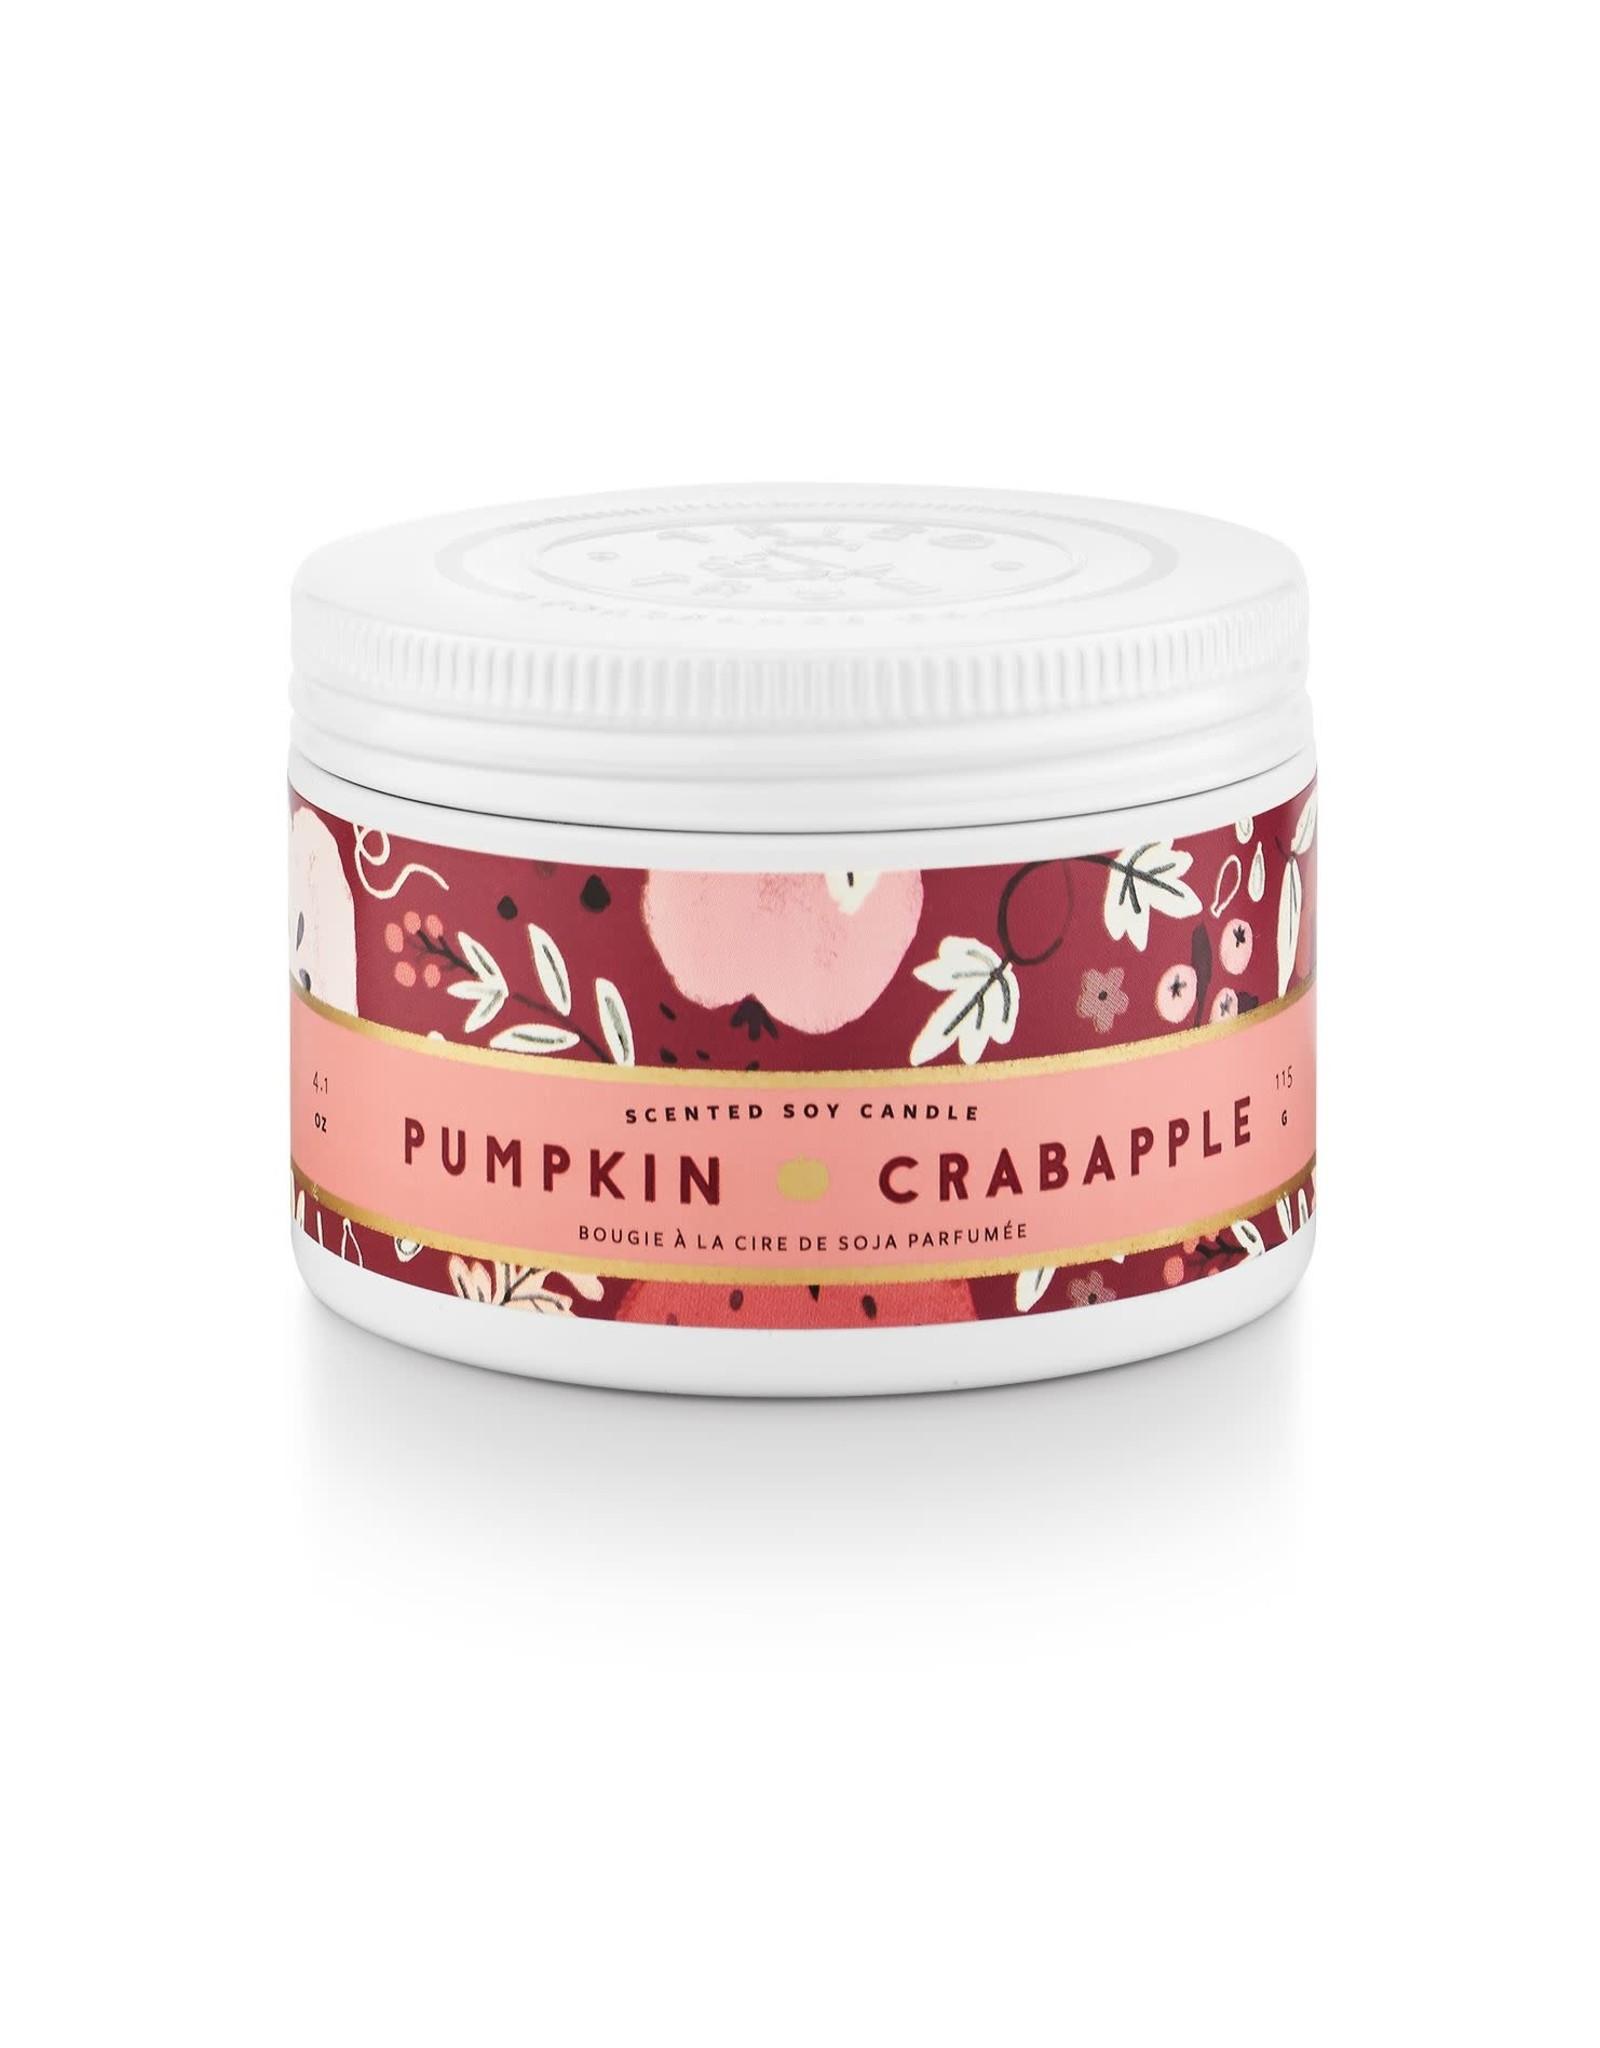 The Florist & The Merchant Pumpkin Crabapple Home Fragrance